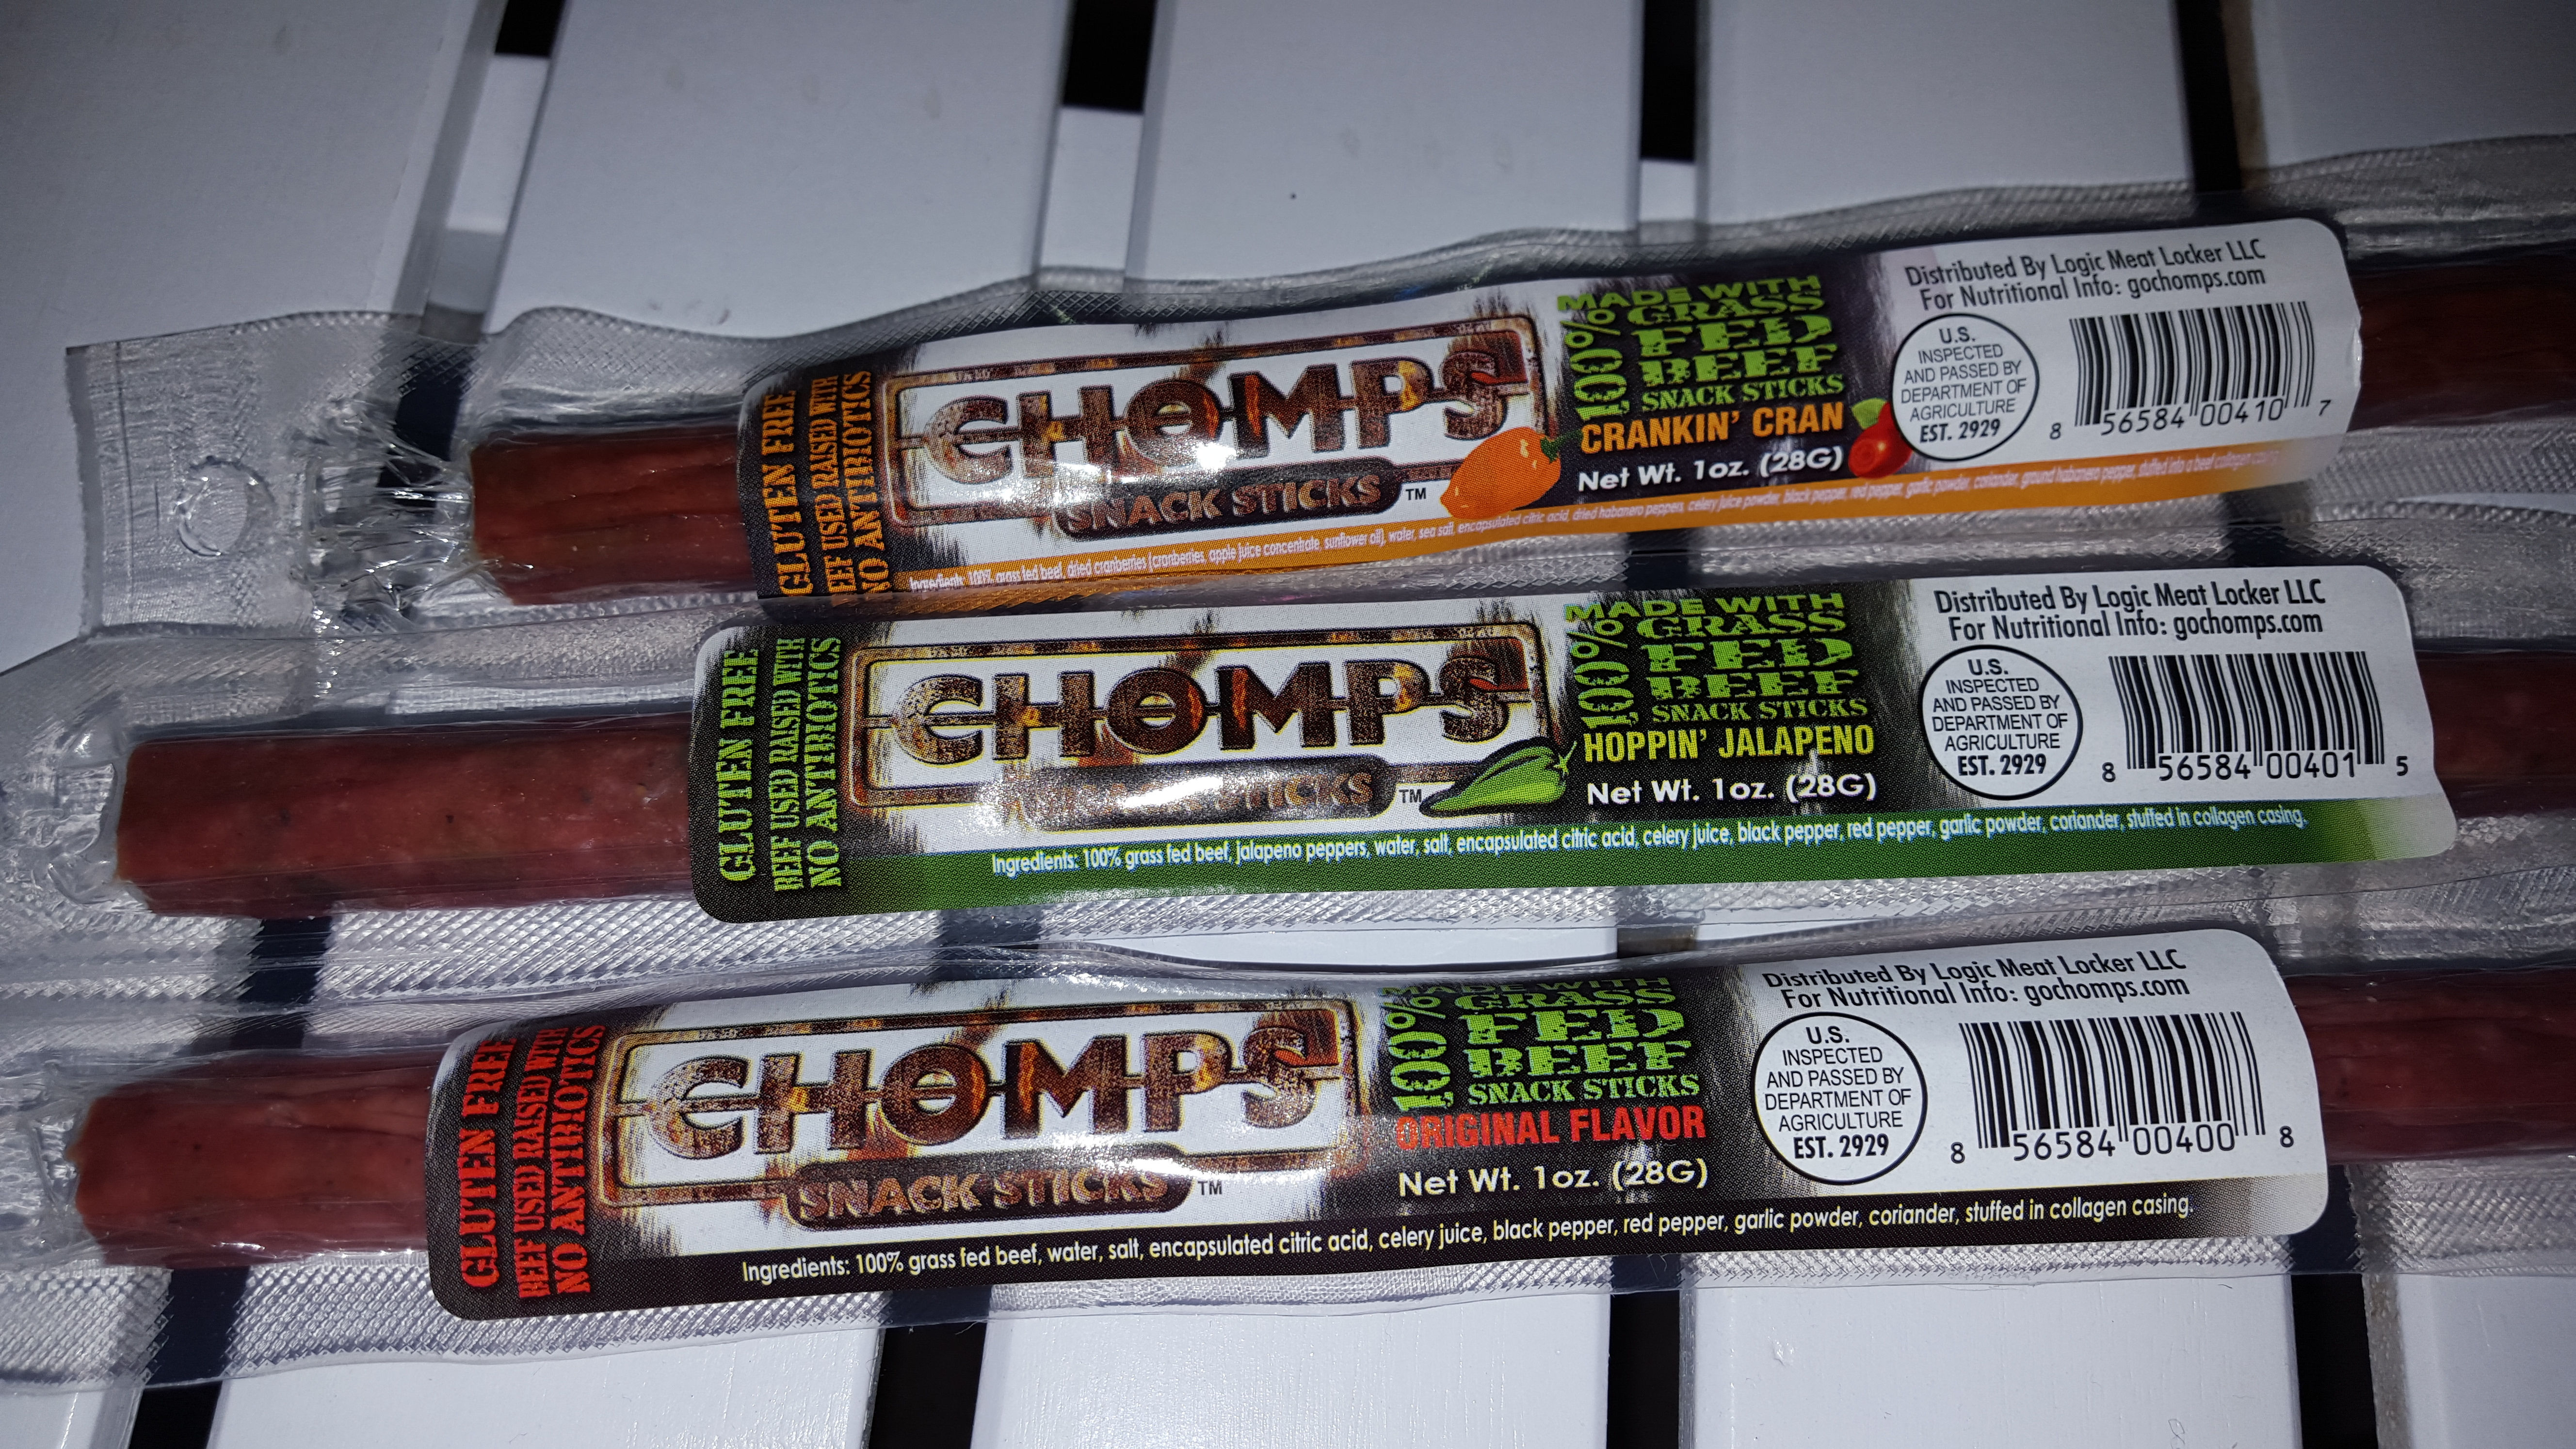 Chomps2